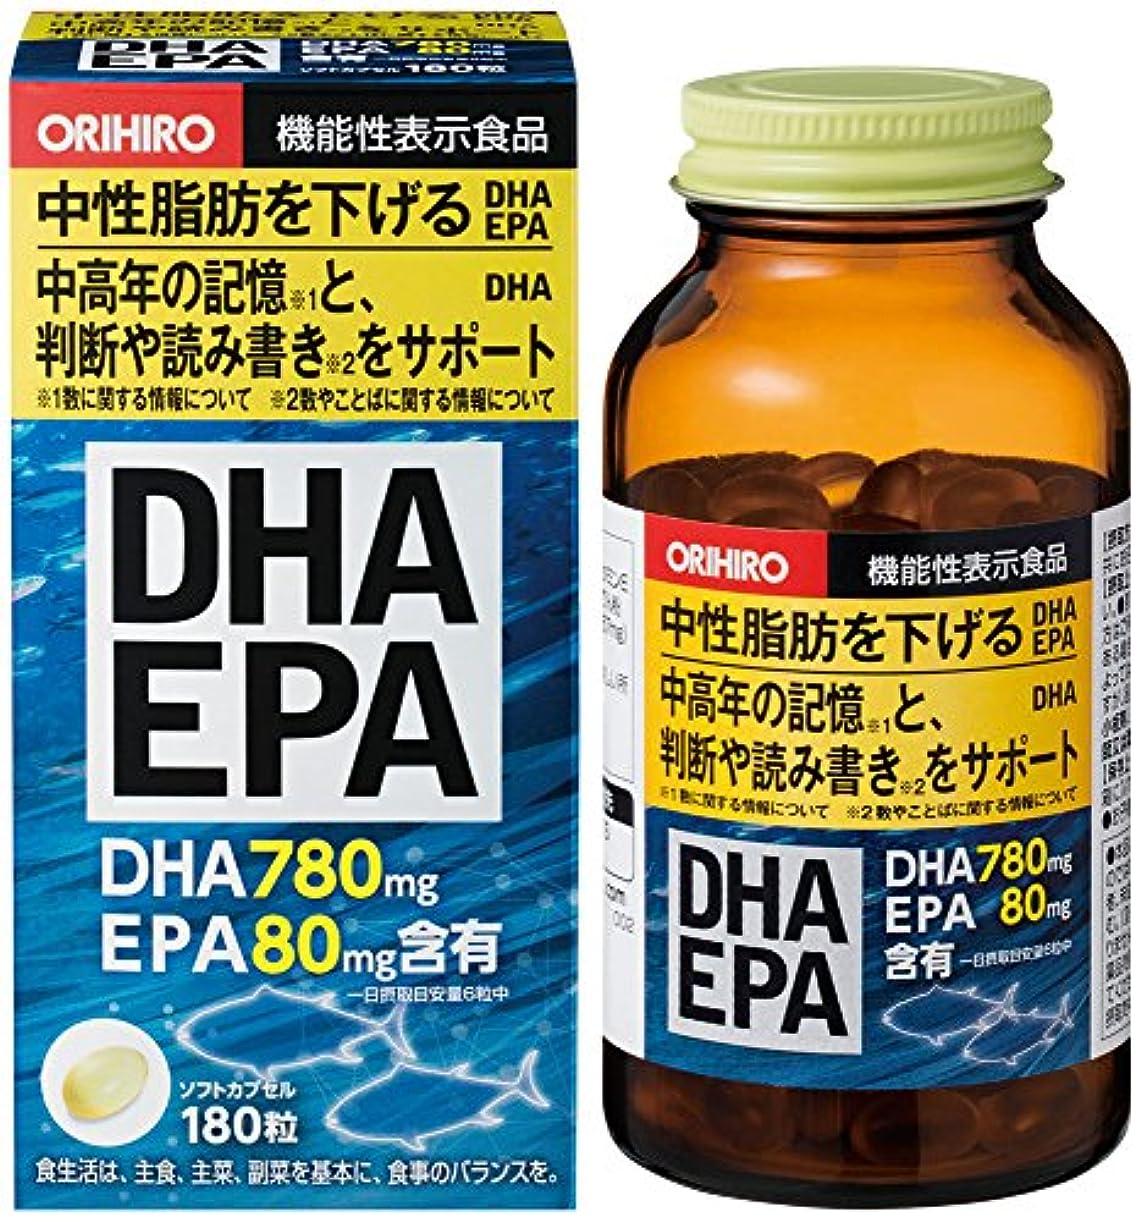 一瞬懸念宝オリヒロ DHA?EPA 180粒 [機能性表示食品]